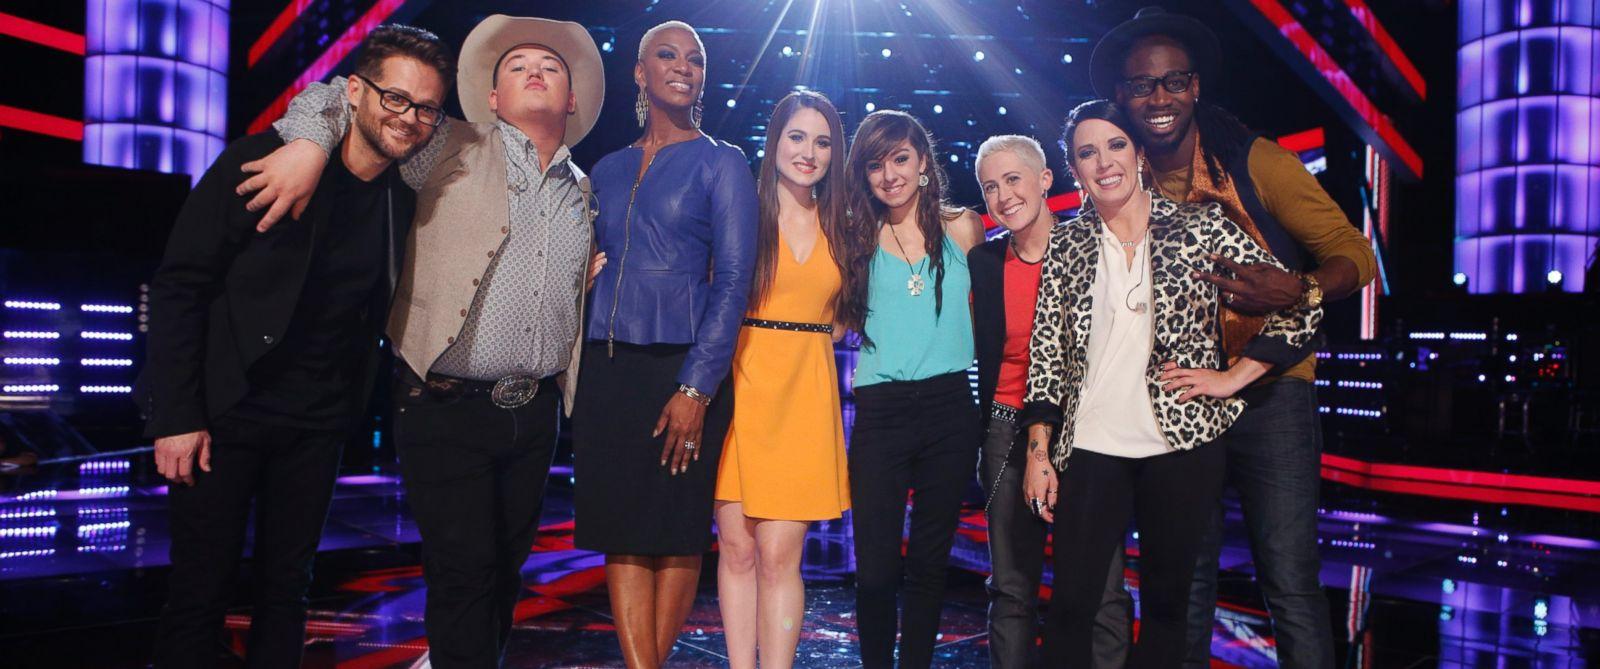 PHOTO: Contestants of The Voice